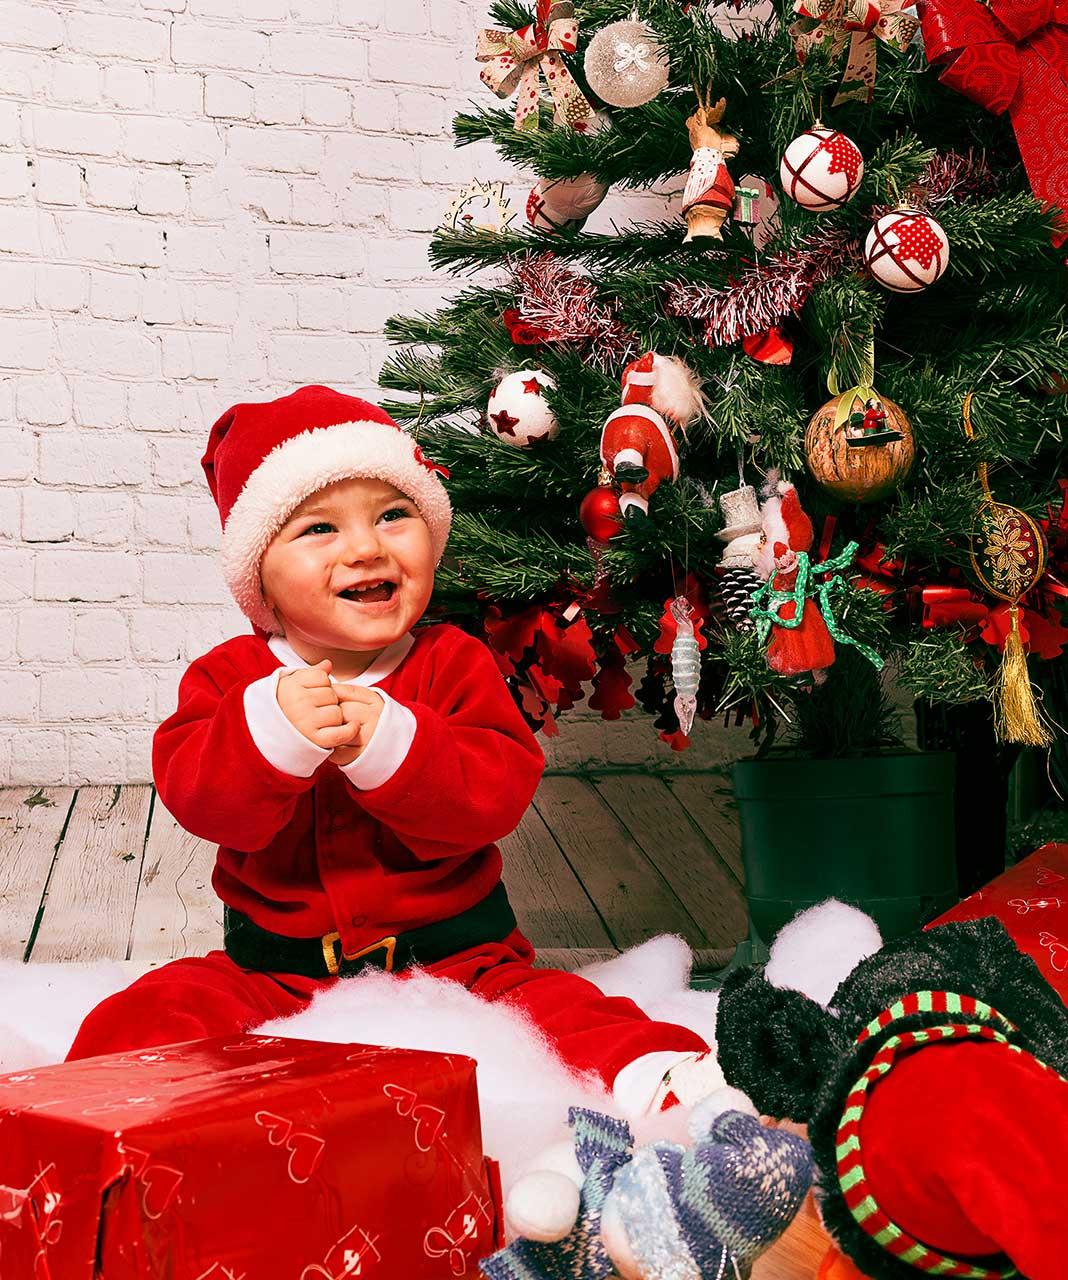 https://www.kidsphotography.es/wp-content/uploads/2021/04/Sesiones-Navidad-Ixeia-0634-©-Kids-Photography.jpg